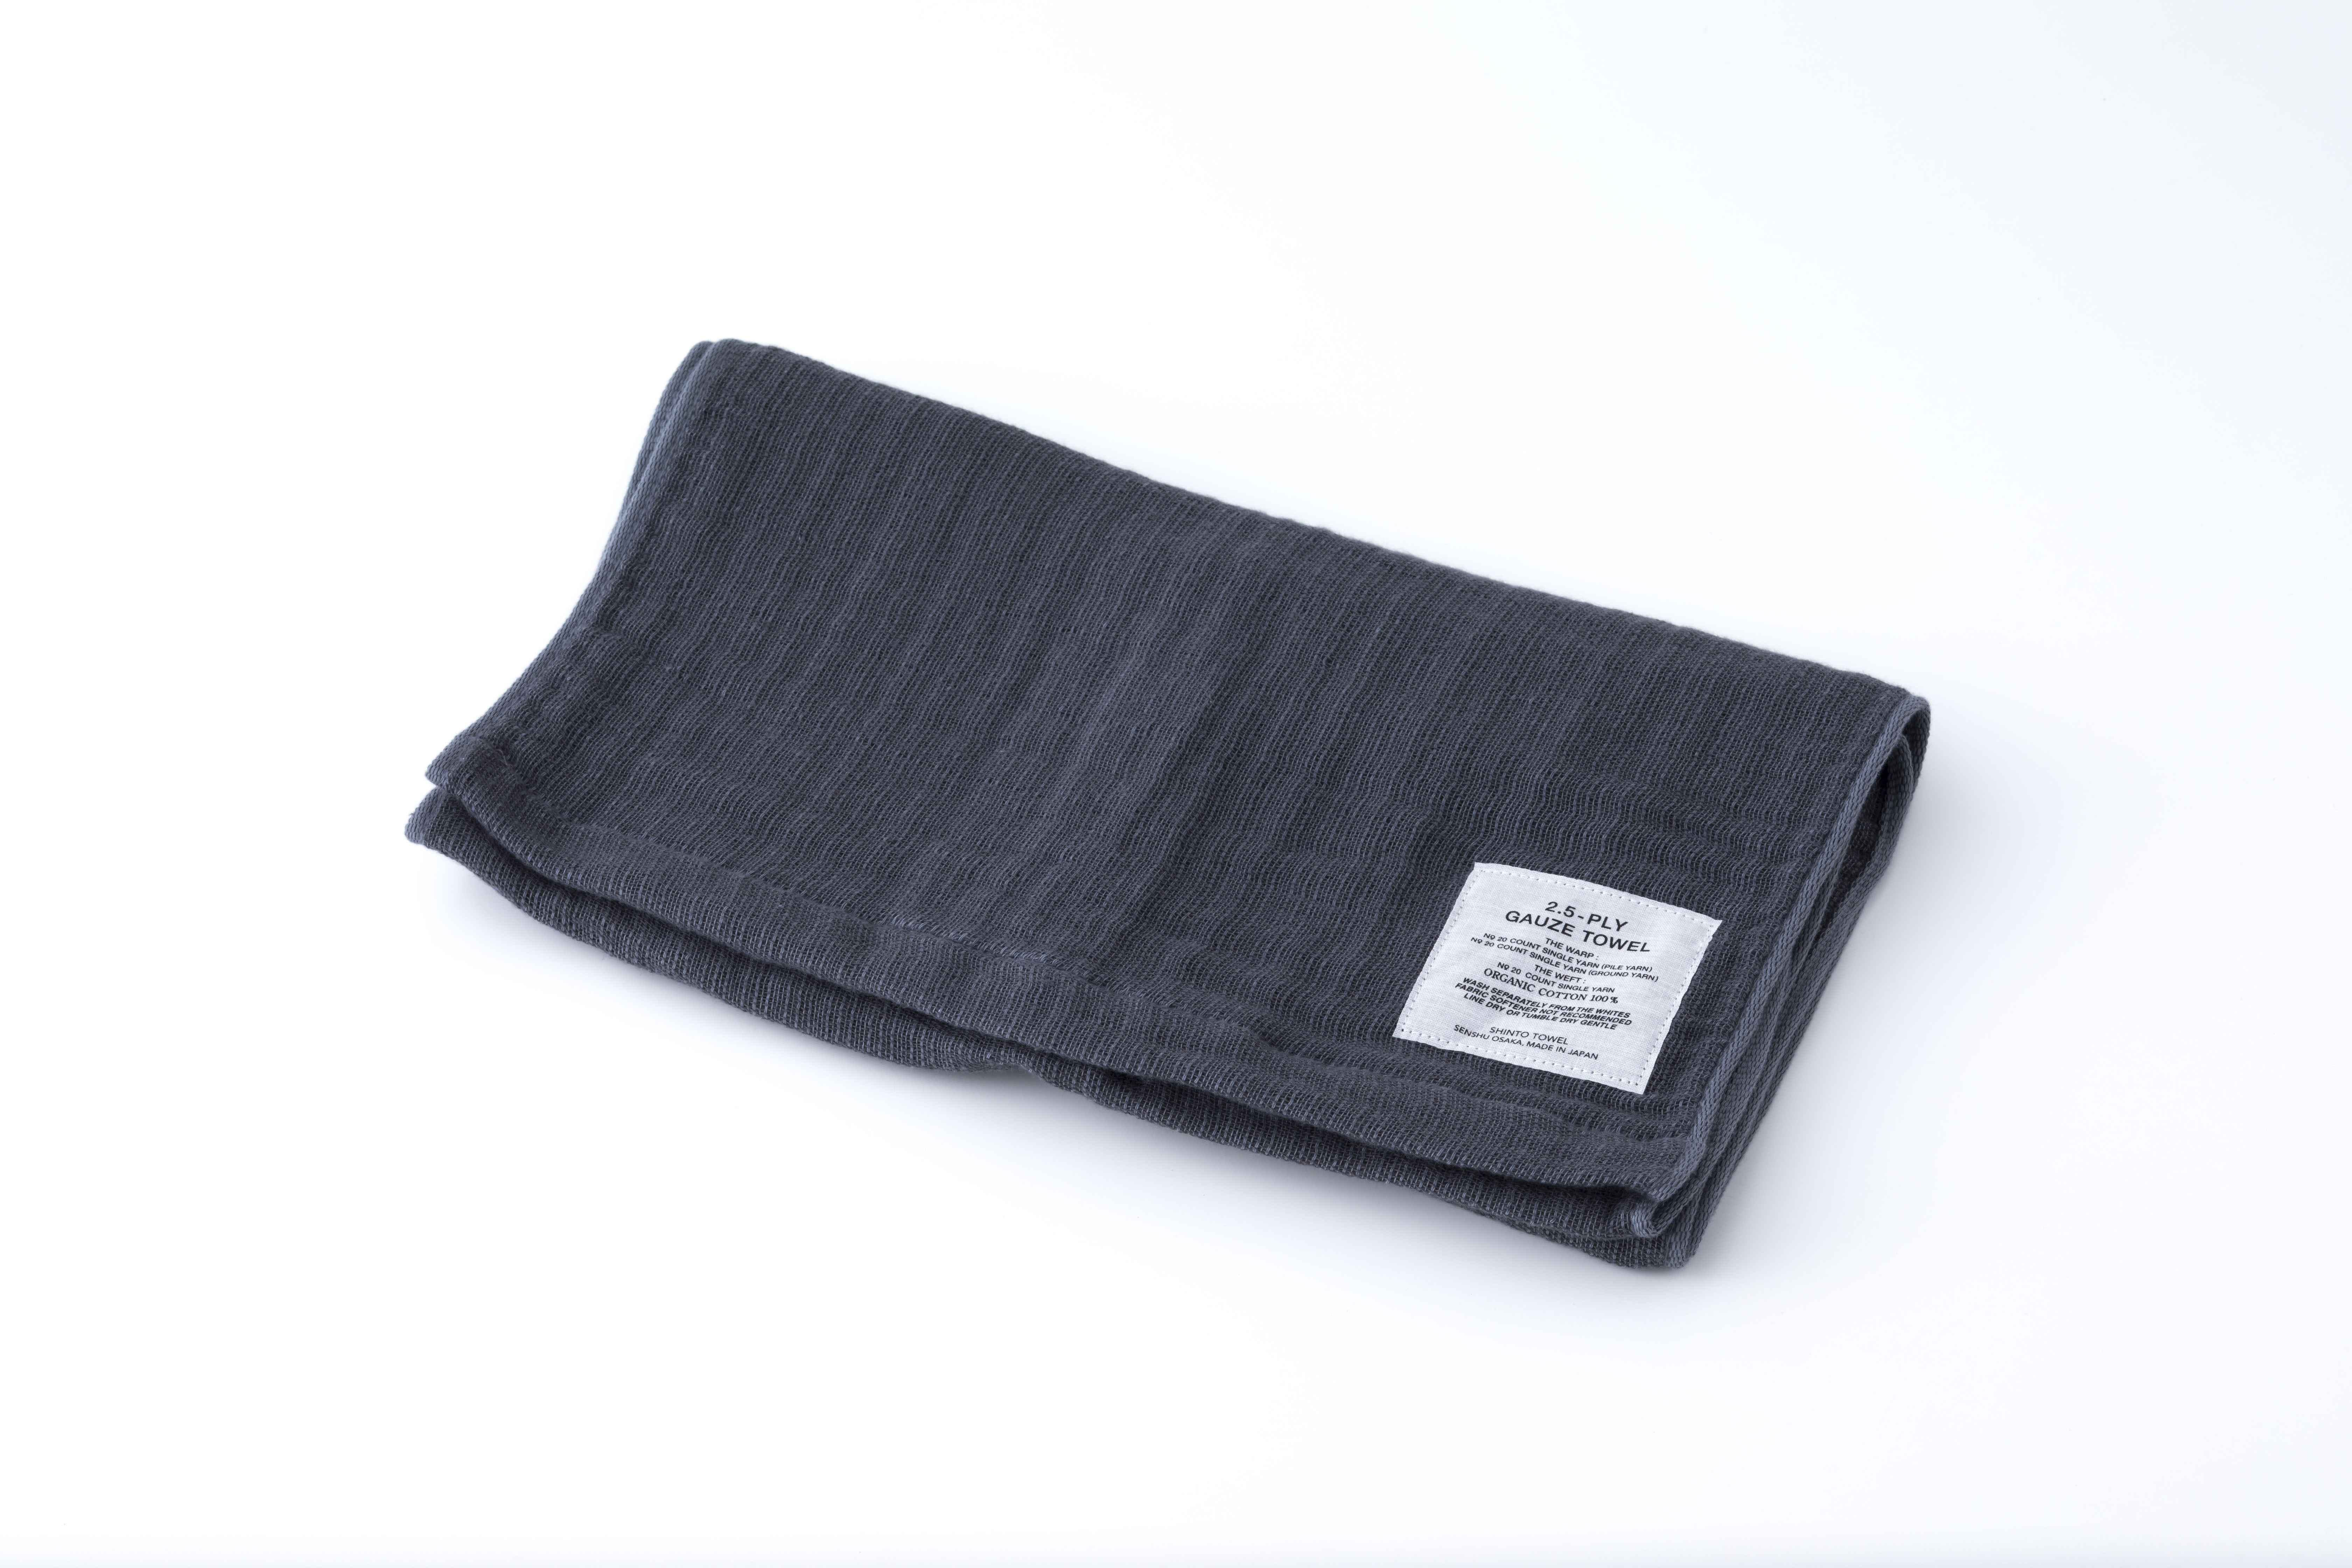 2.5-PLY GAUZE TOWEL:MUFFLER TOWEL (Charcoal) / SHINTO TOWEL